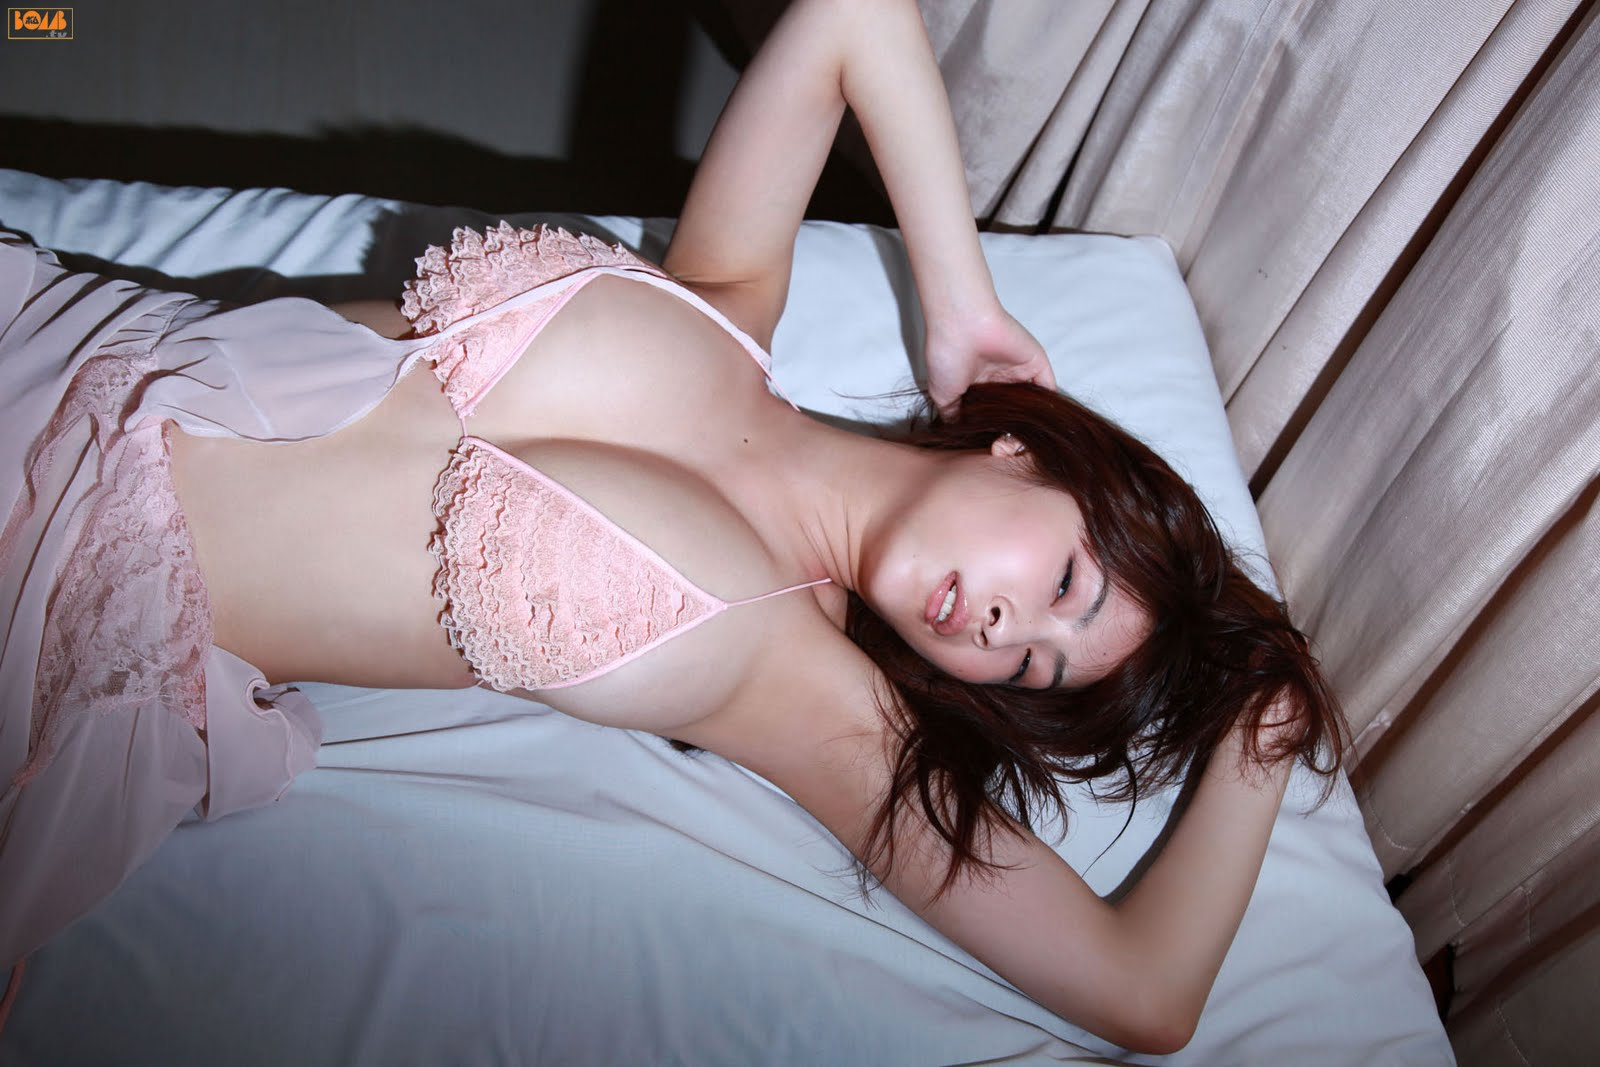 porn pics of kashmir women